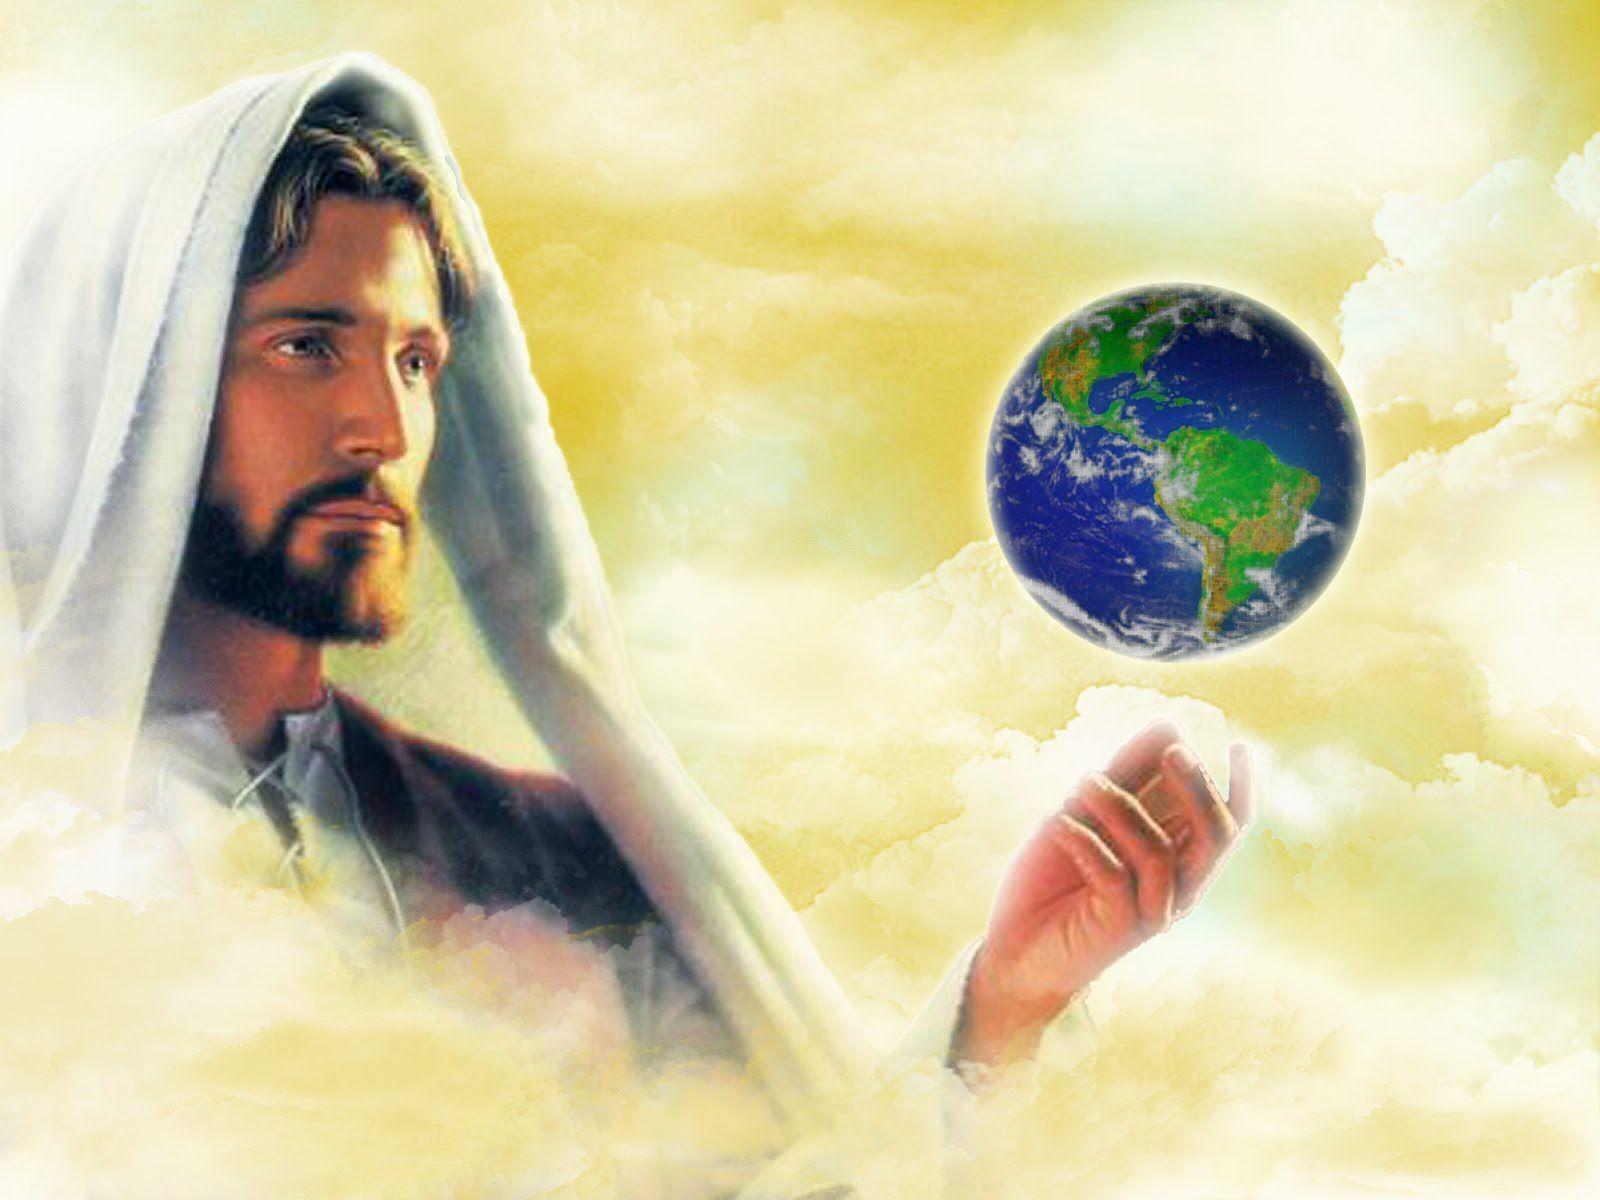 Free Pictures Jesus Christ Jesus Christ Free Desktop Wallpapers Free Christian Wallpapers Jesus Wallpaper Jesus Christ Jesus Images